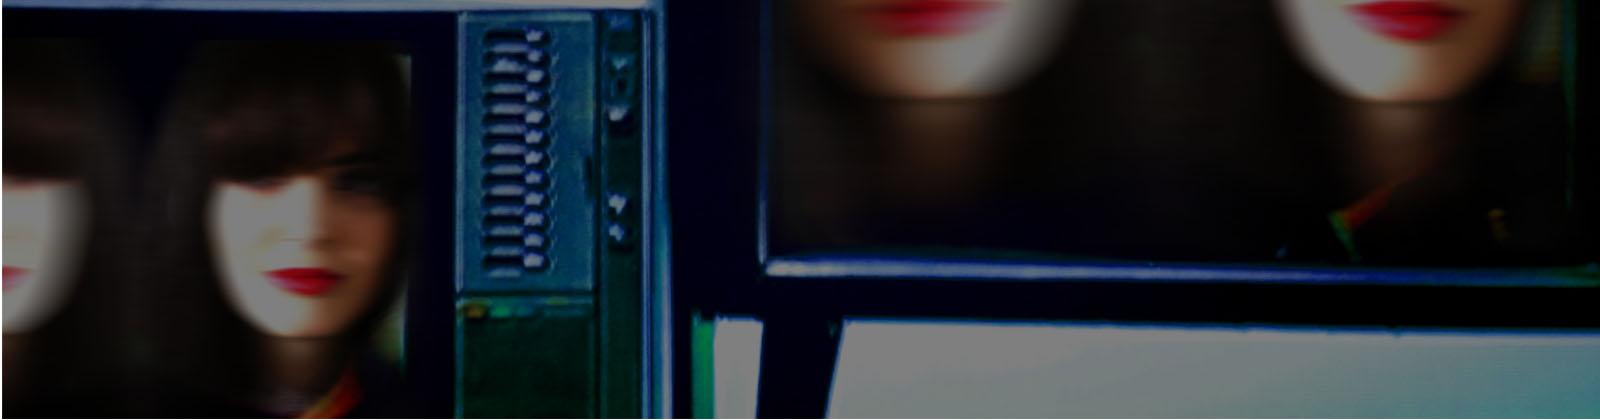 MODE TV